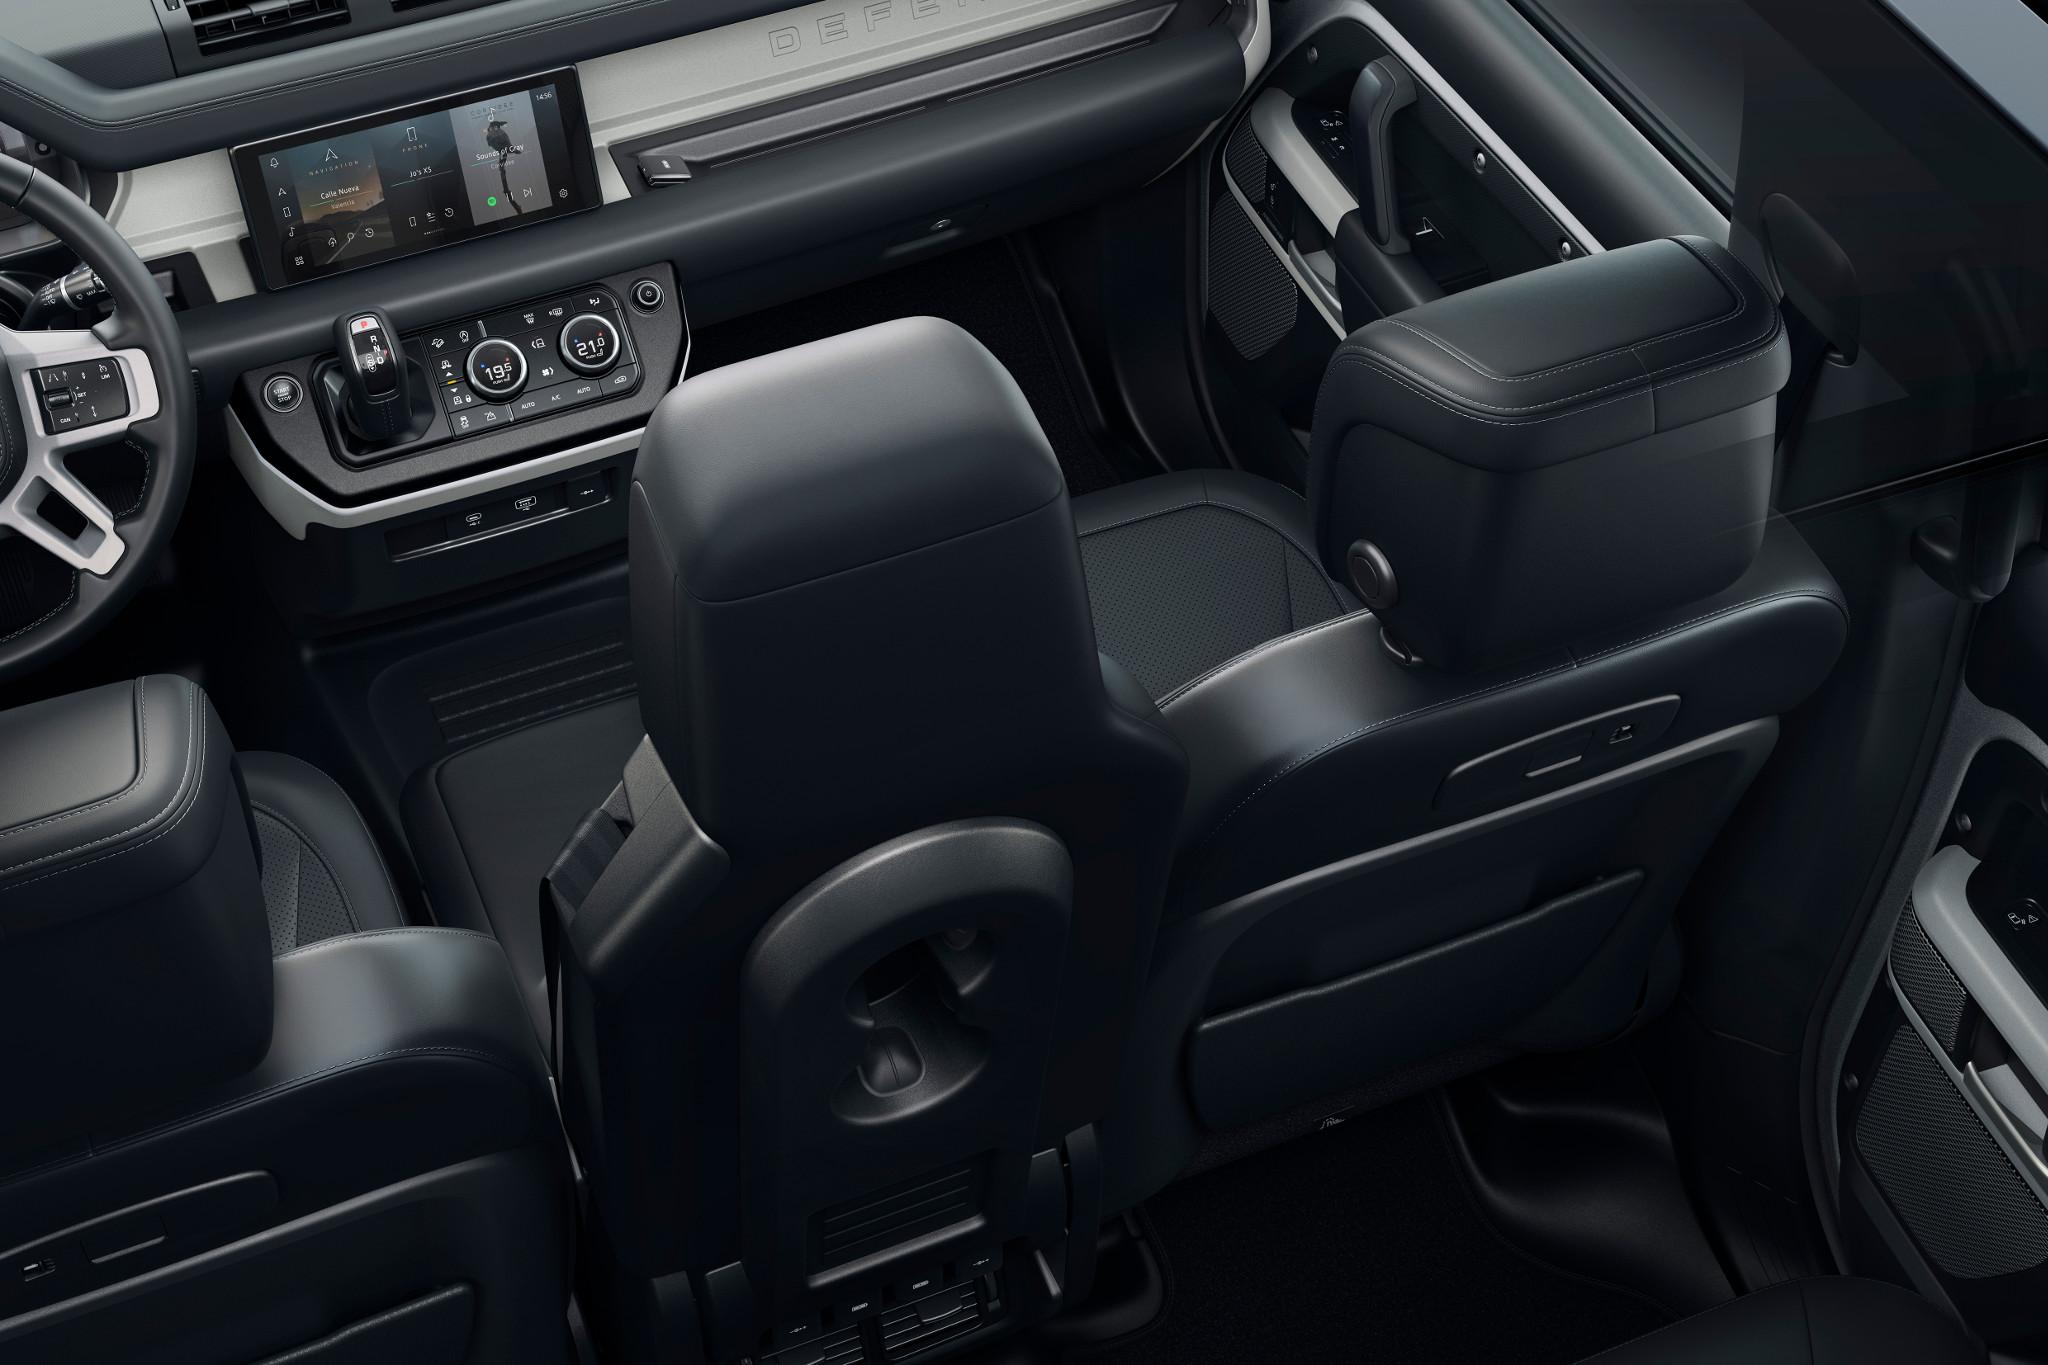 land-rover-defender-2020-11-front-row--interior.jpg